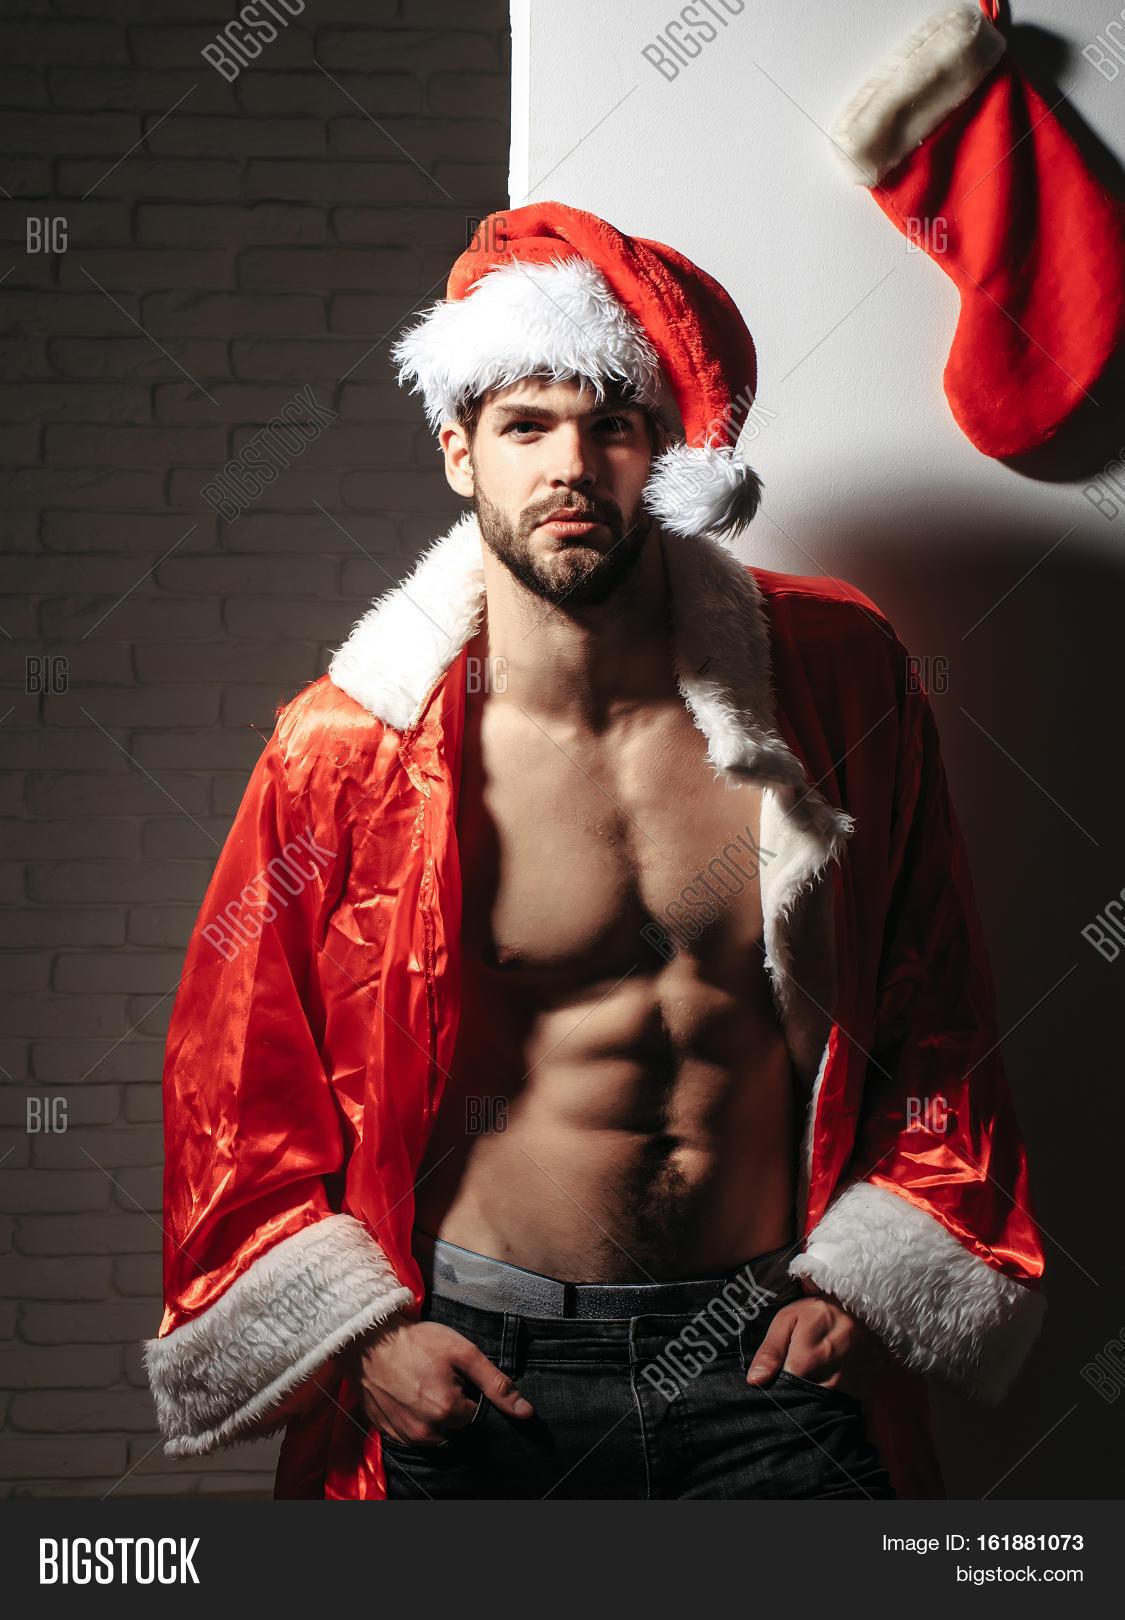 handsome sexy christmas xmas man image photo bigstock. Black Bedroom Furniture Sets. Home Design Ideas